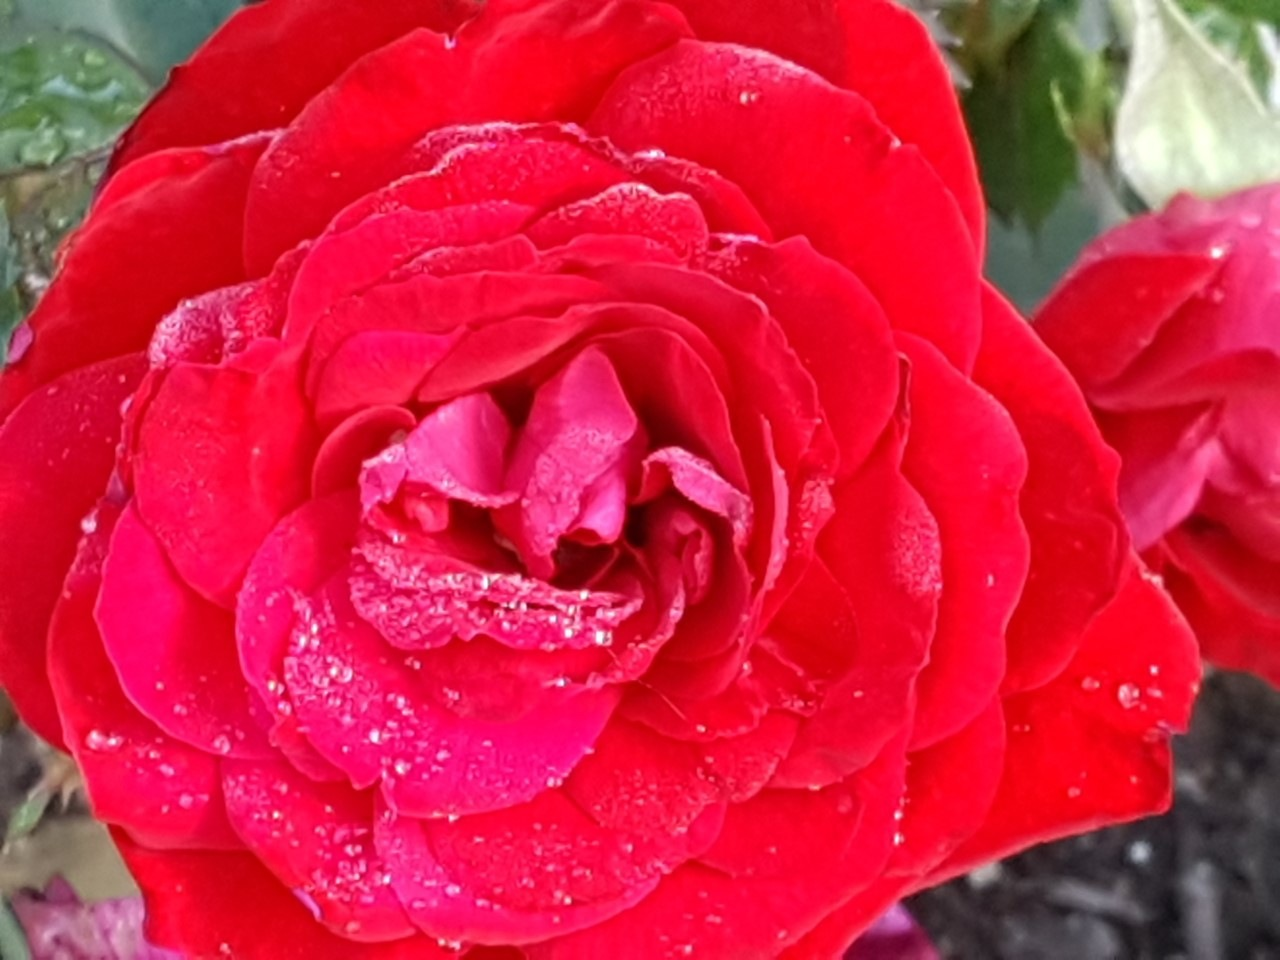 Screaming Flower by Marilyn Linton